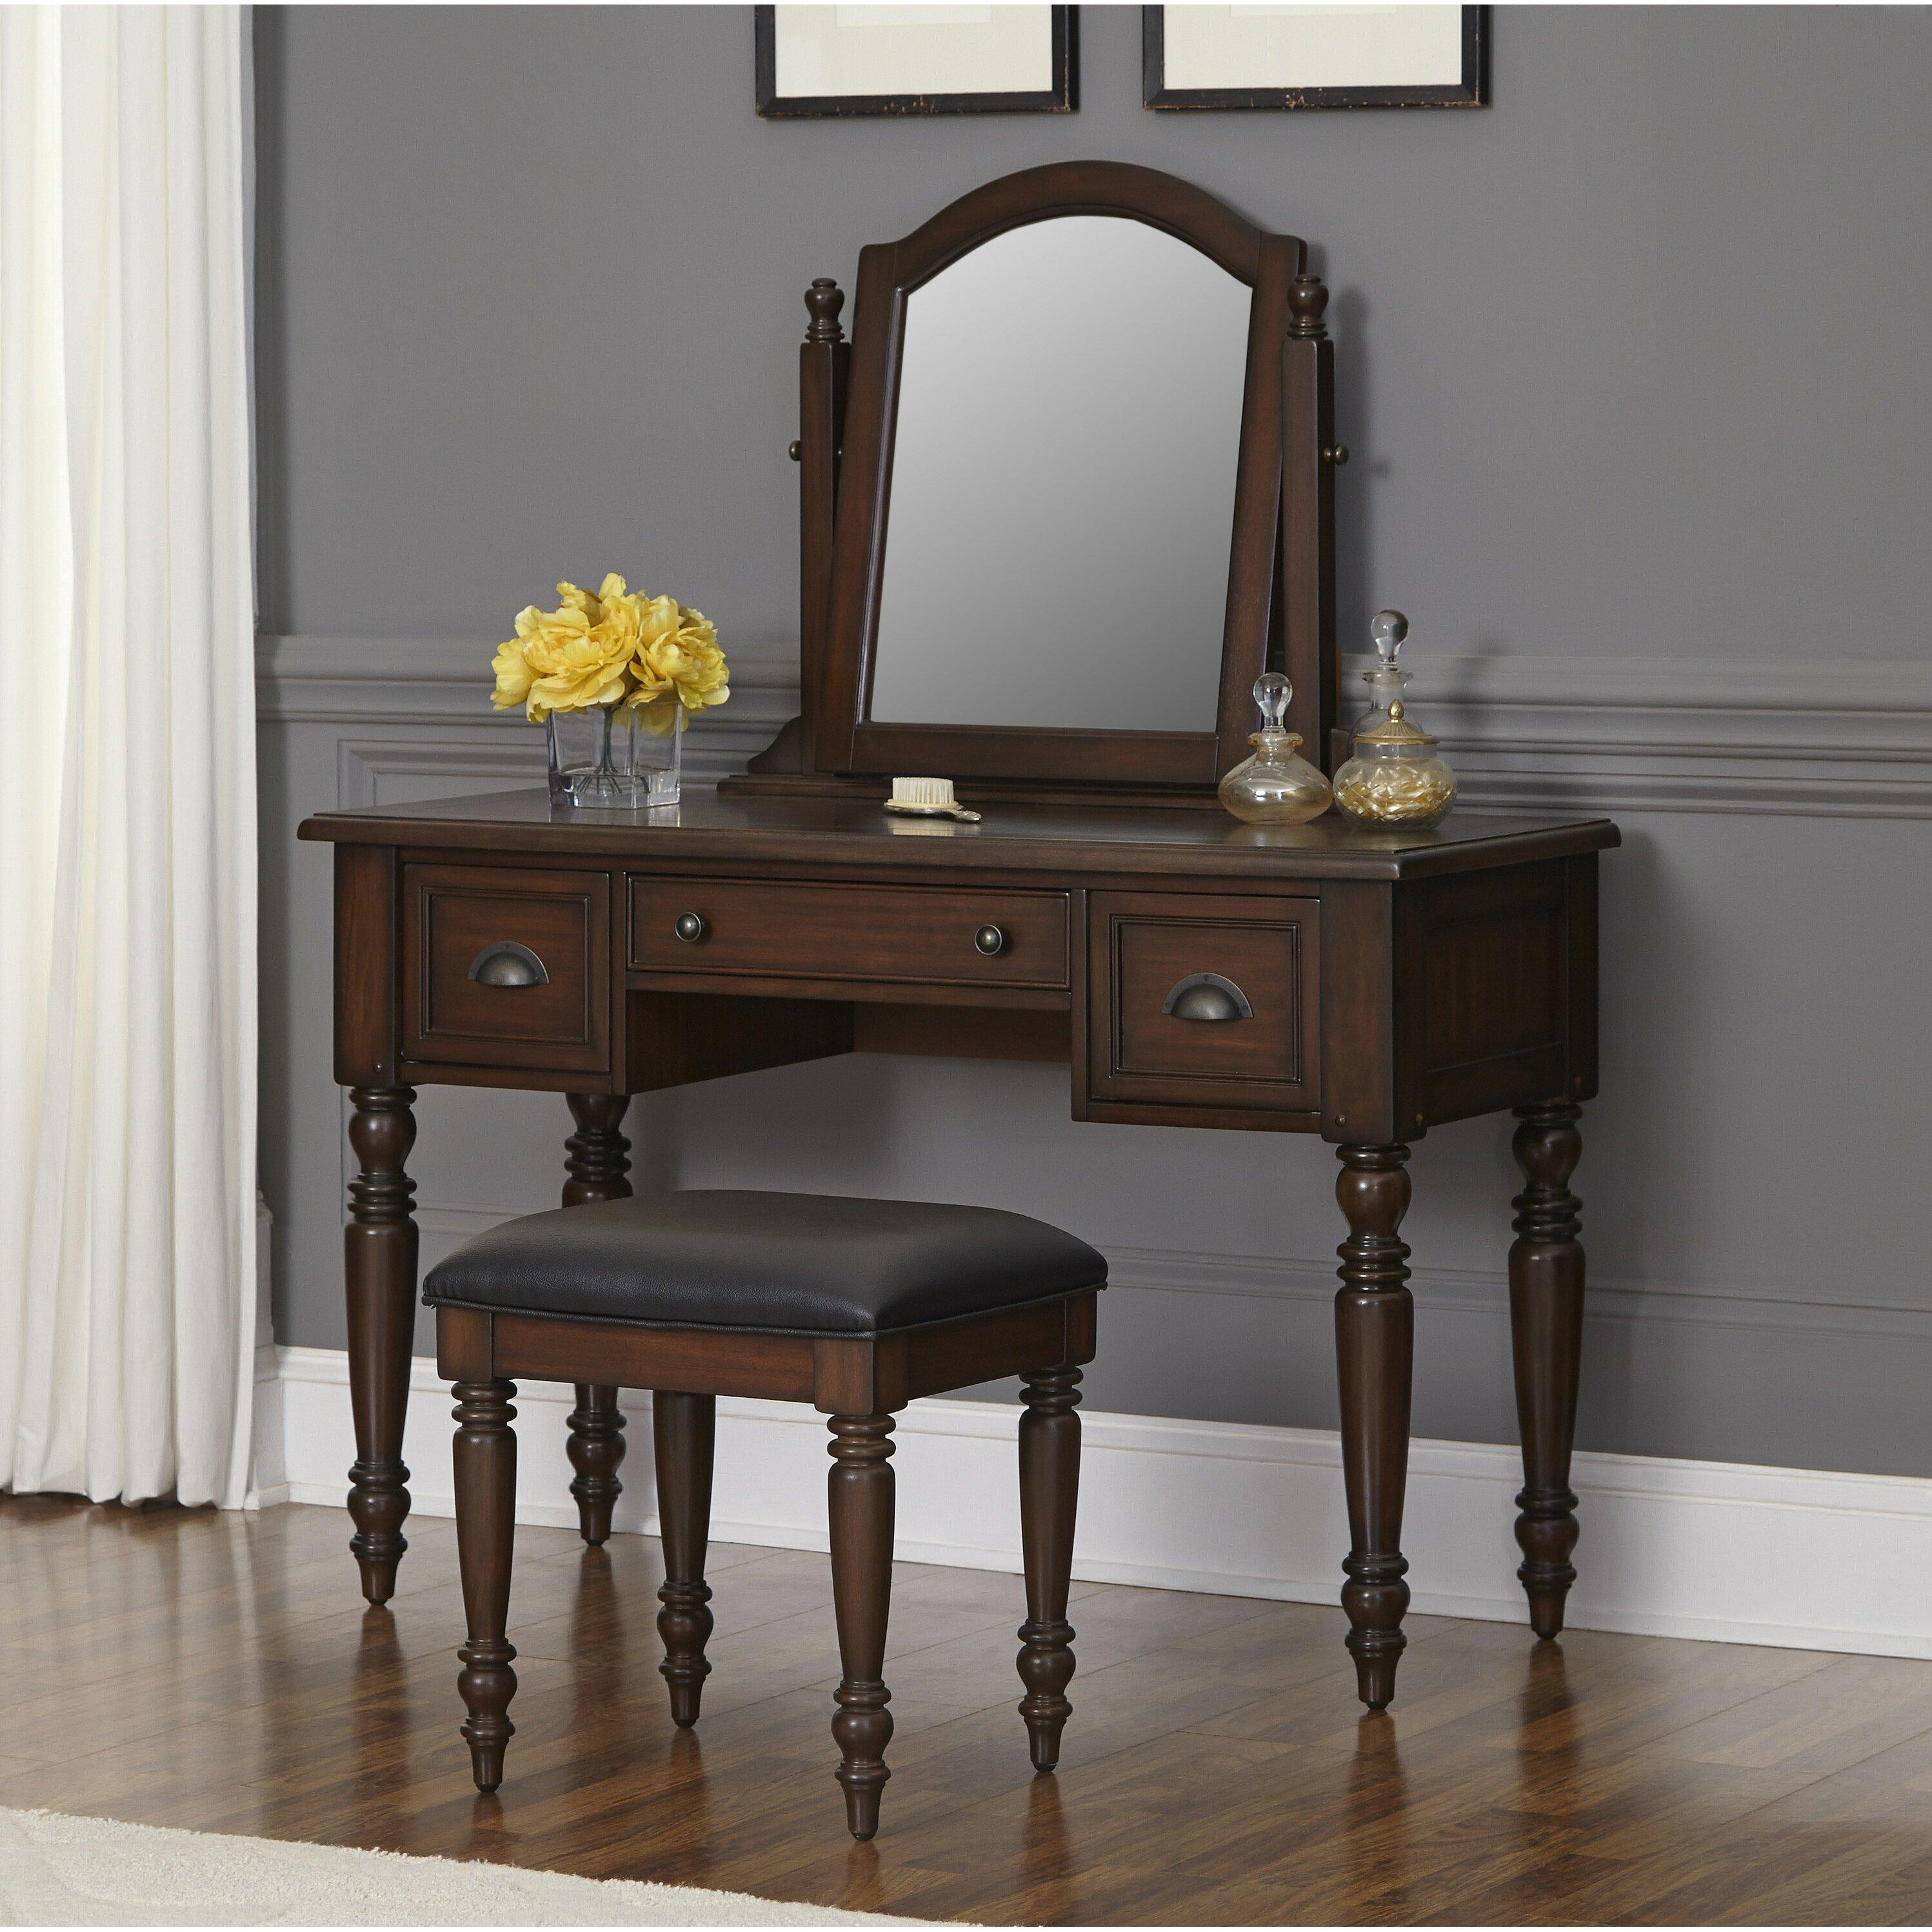 Country Bathroom Vanity Cabinets Indianapolis Inspirations Deebonk